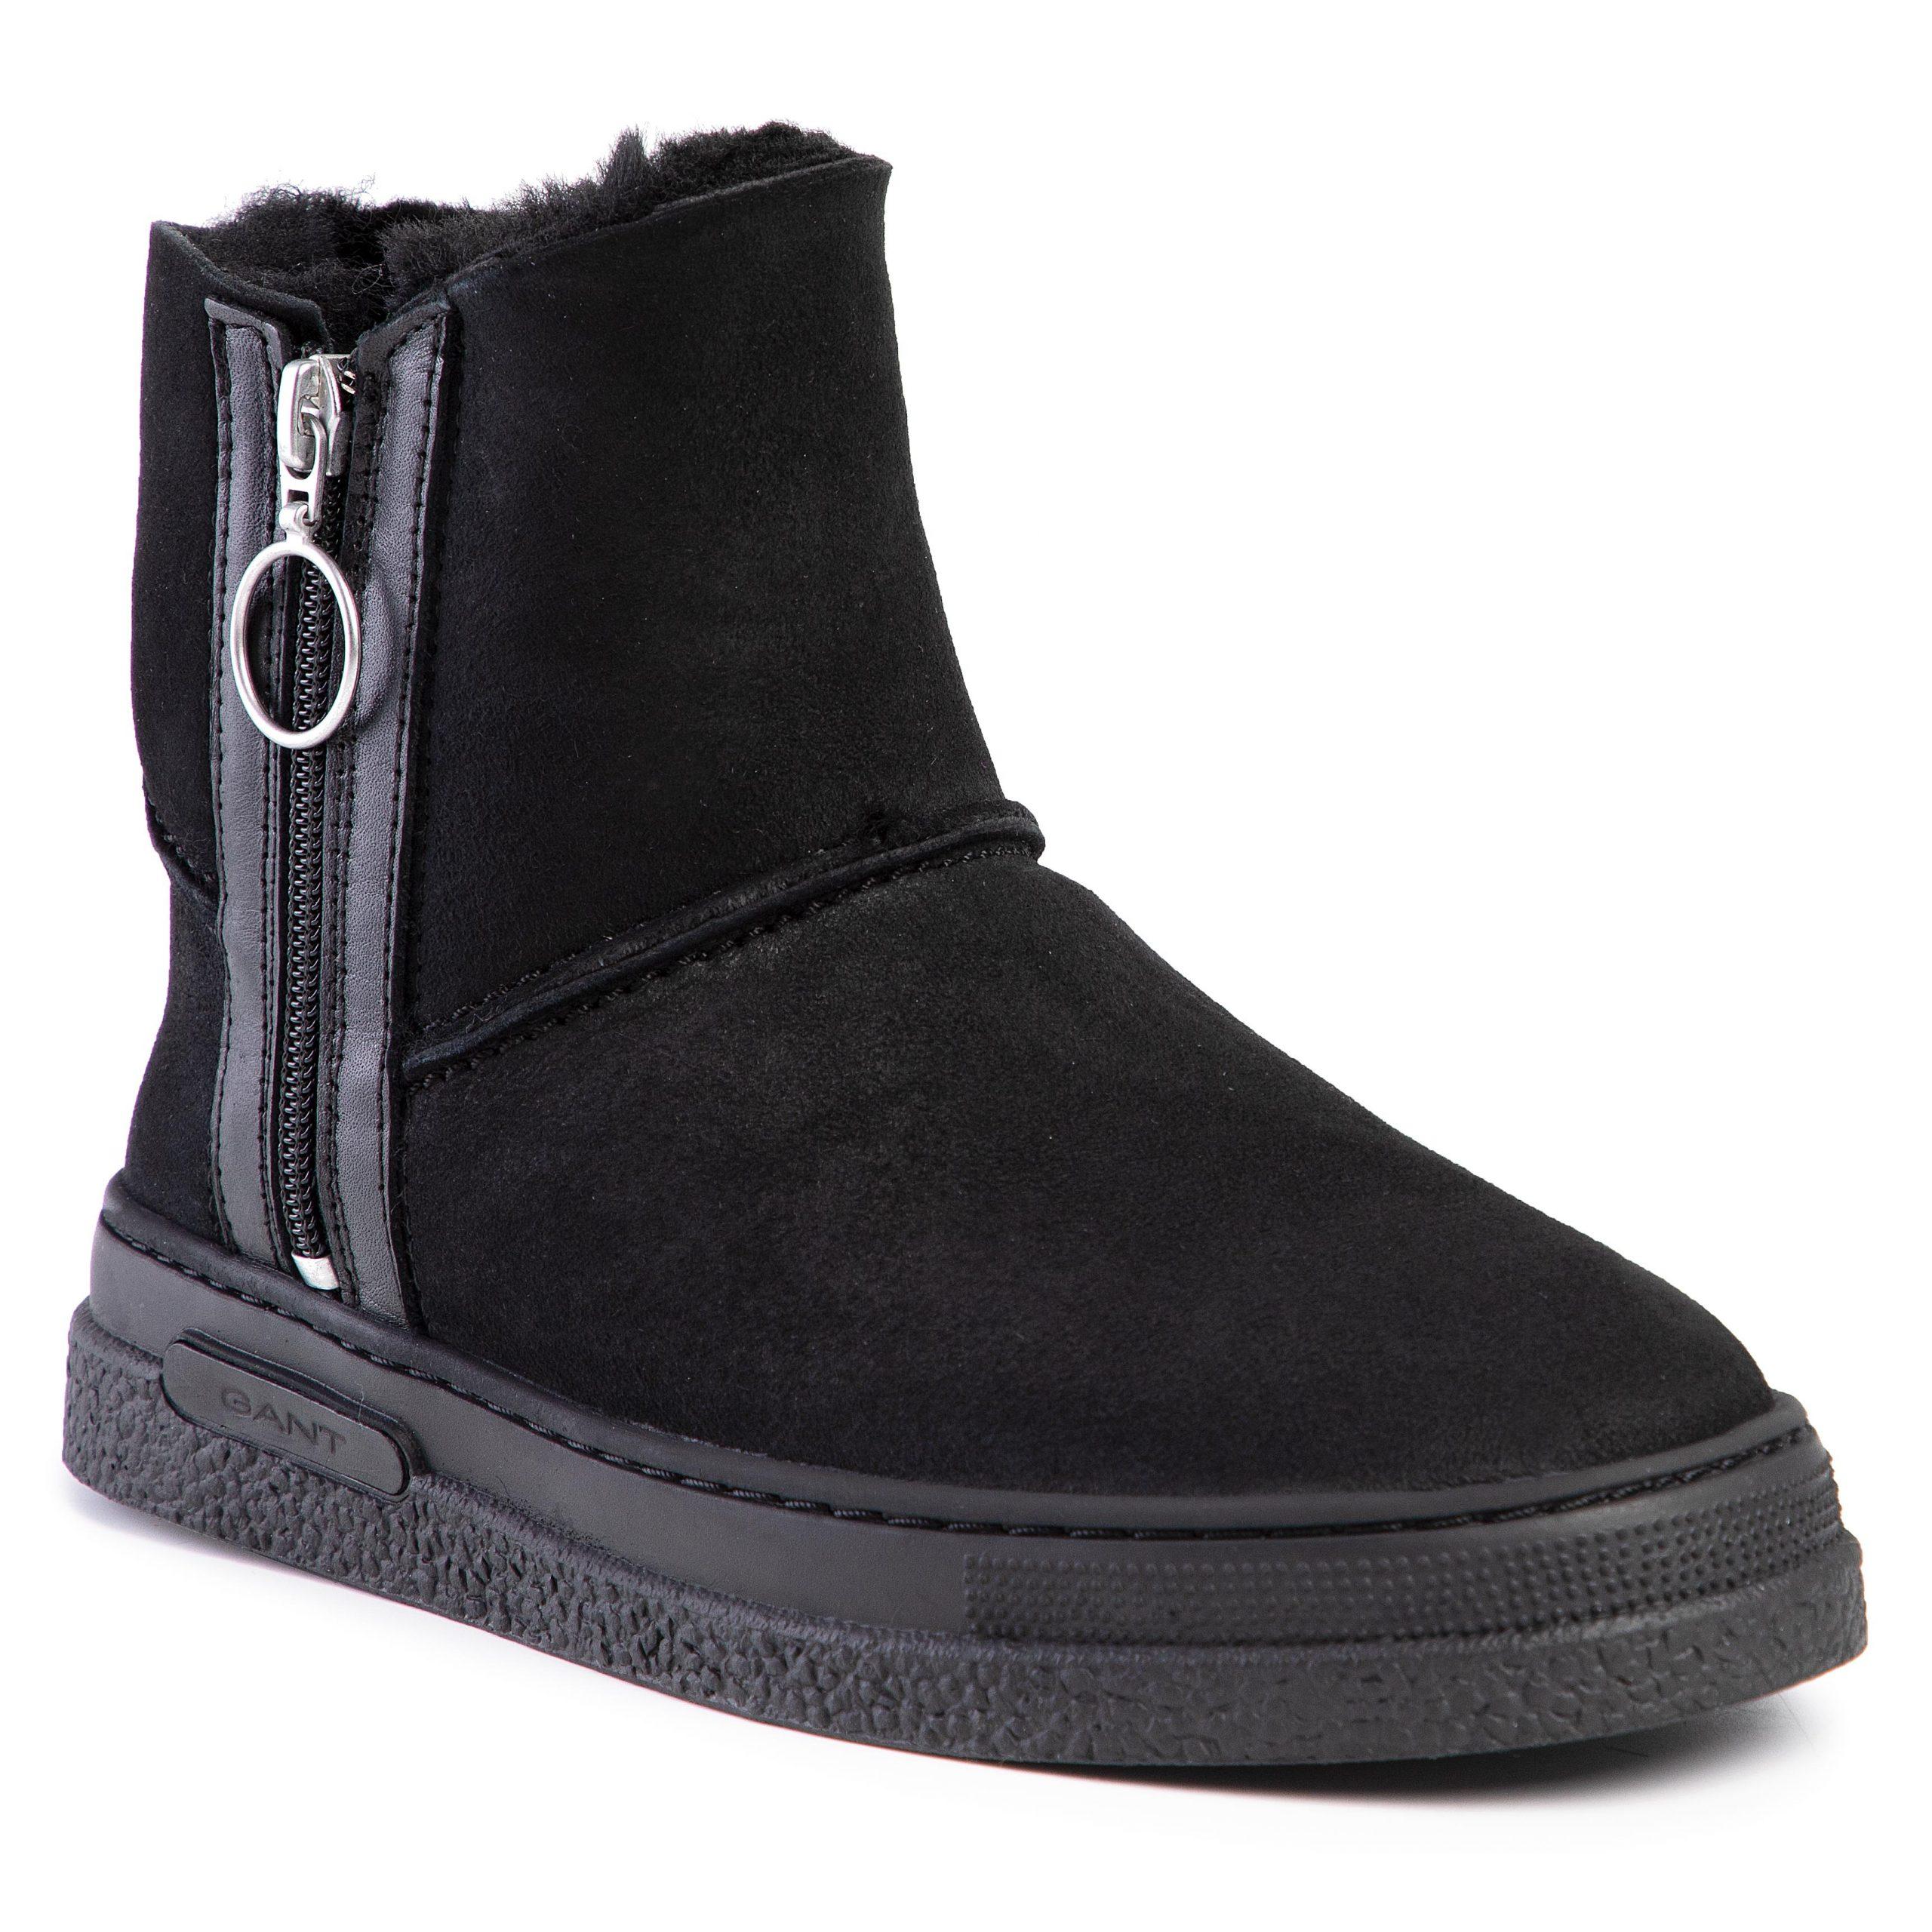 Pantofi GANT - Maria 19559951 Black G00